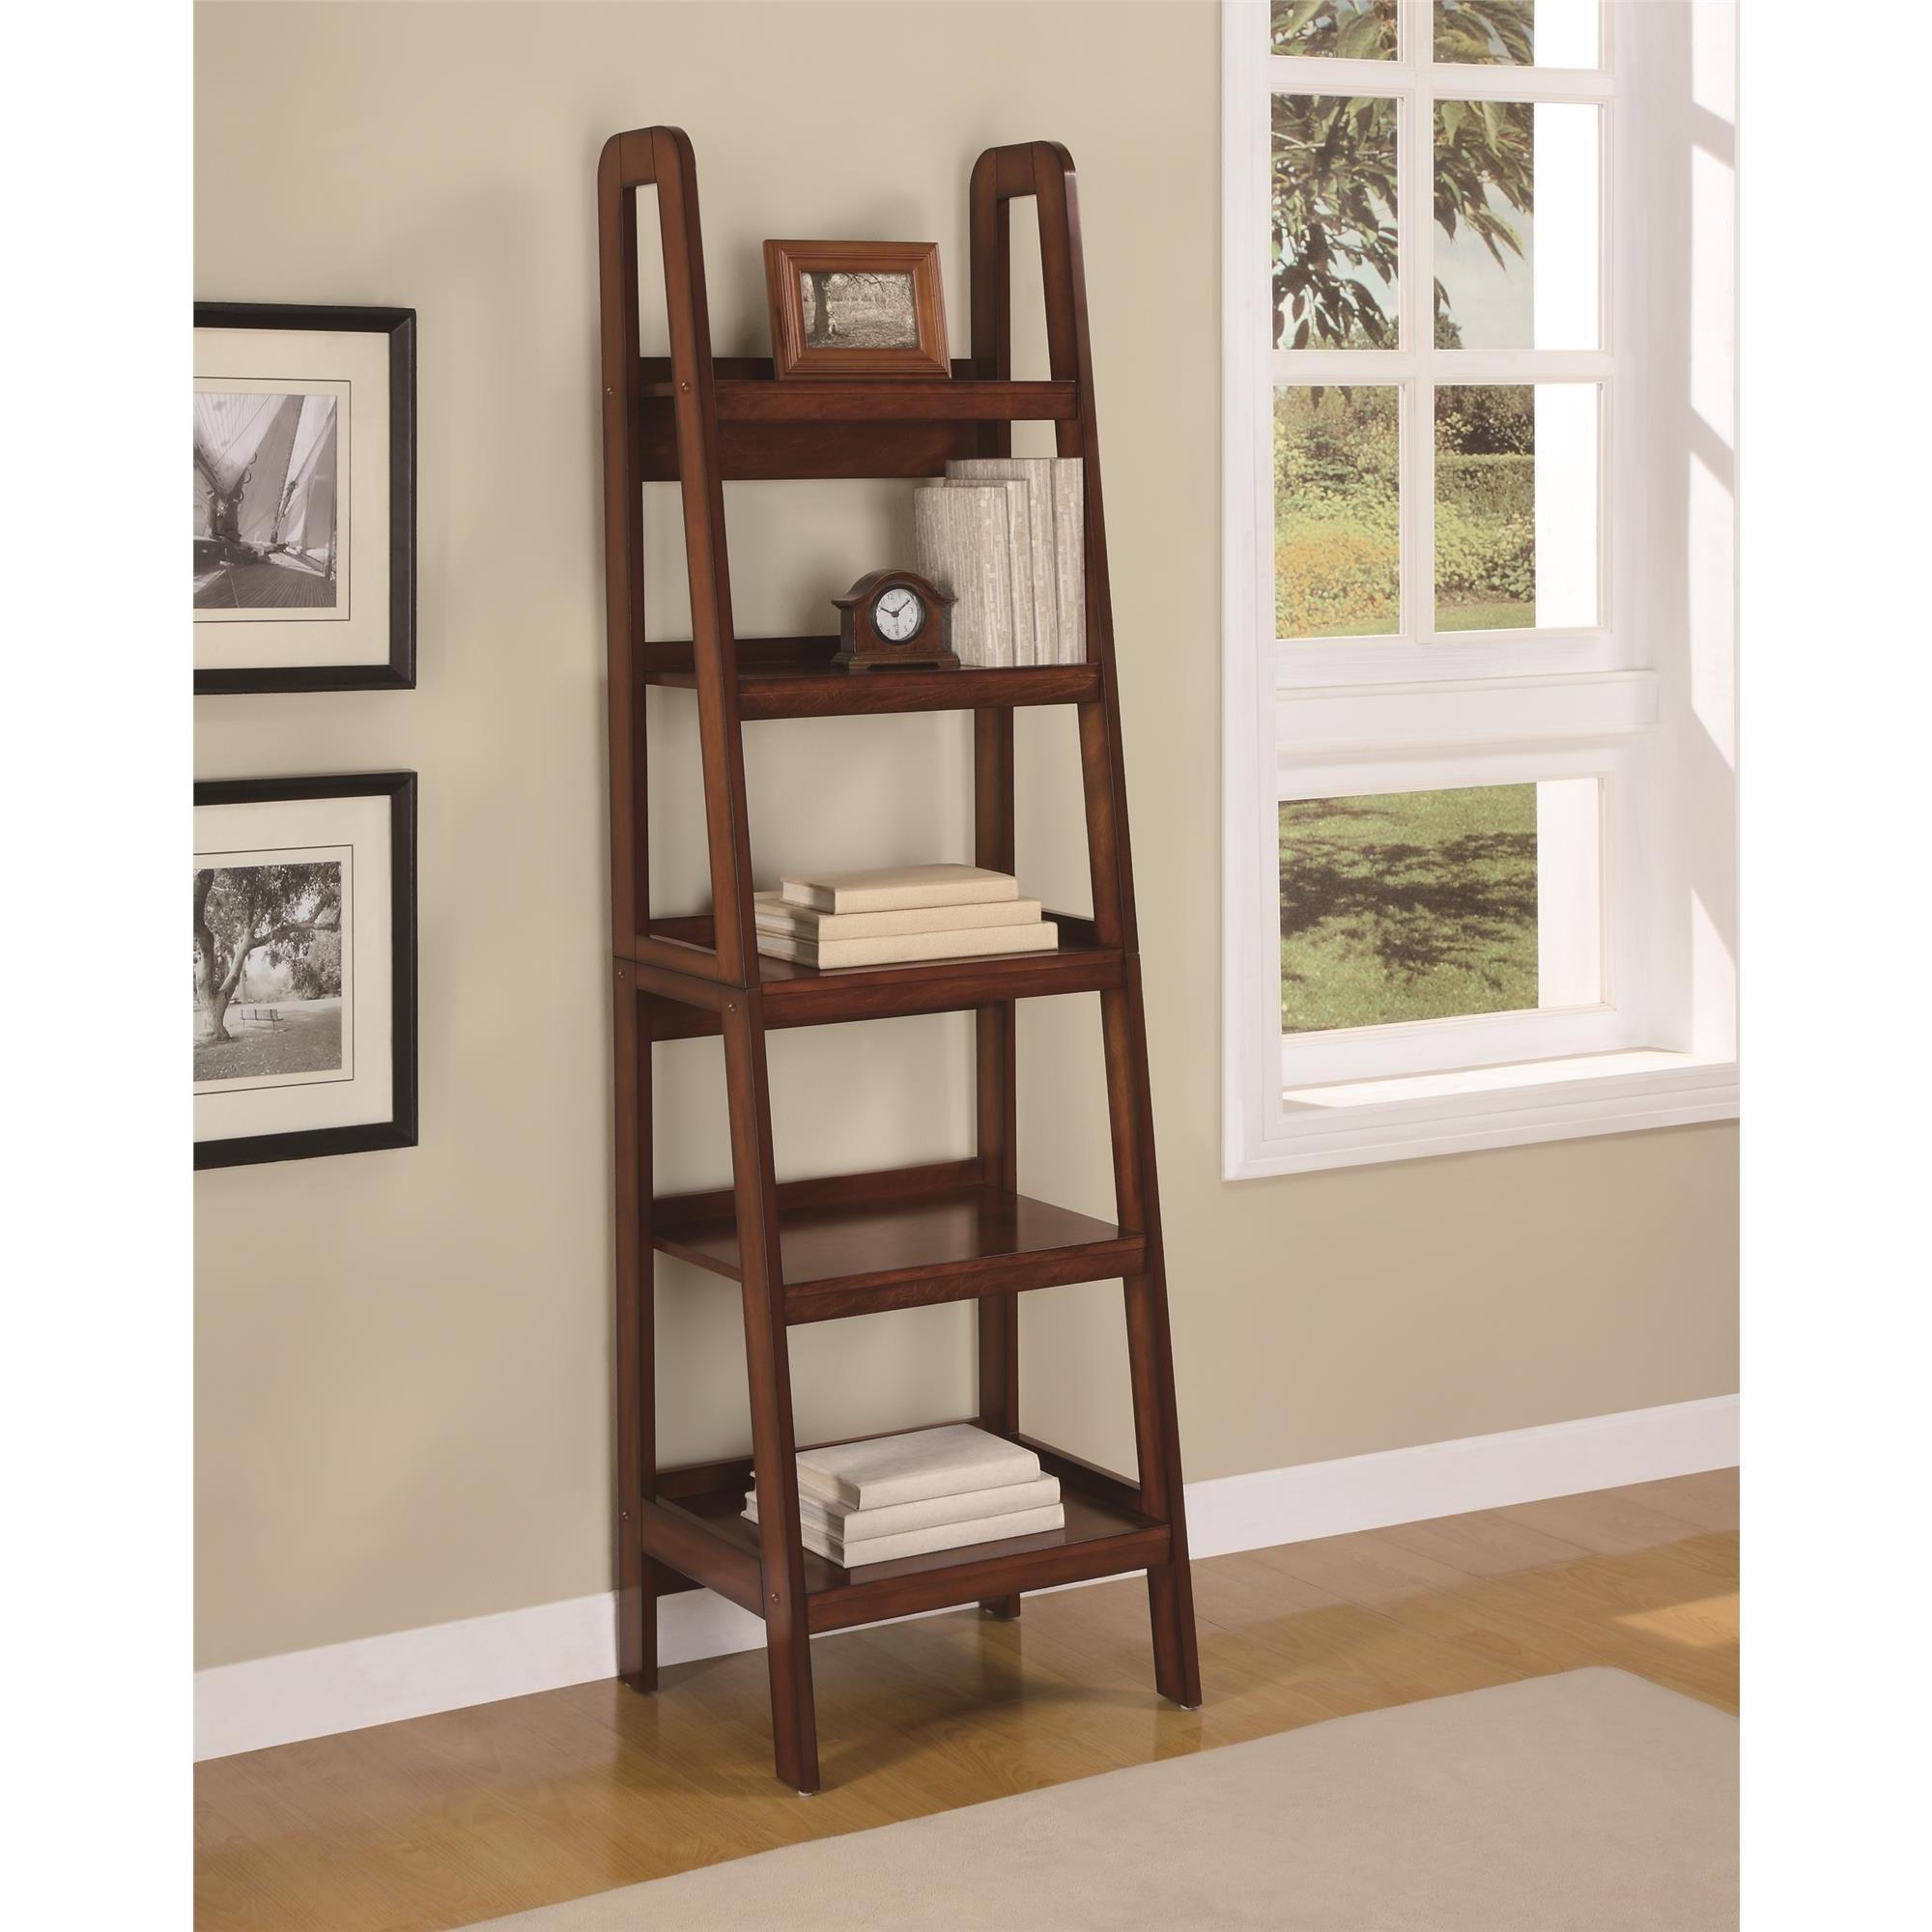 Avenue Greene Glenhaven Mahogany Ladder Bookcase - Free Shipping Today -  Overstock.com - 18097517